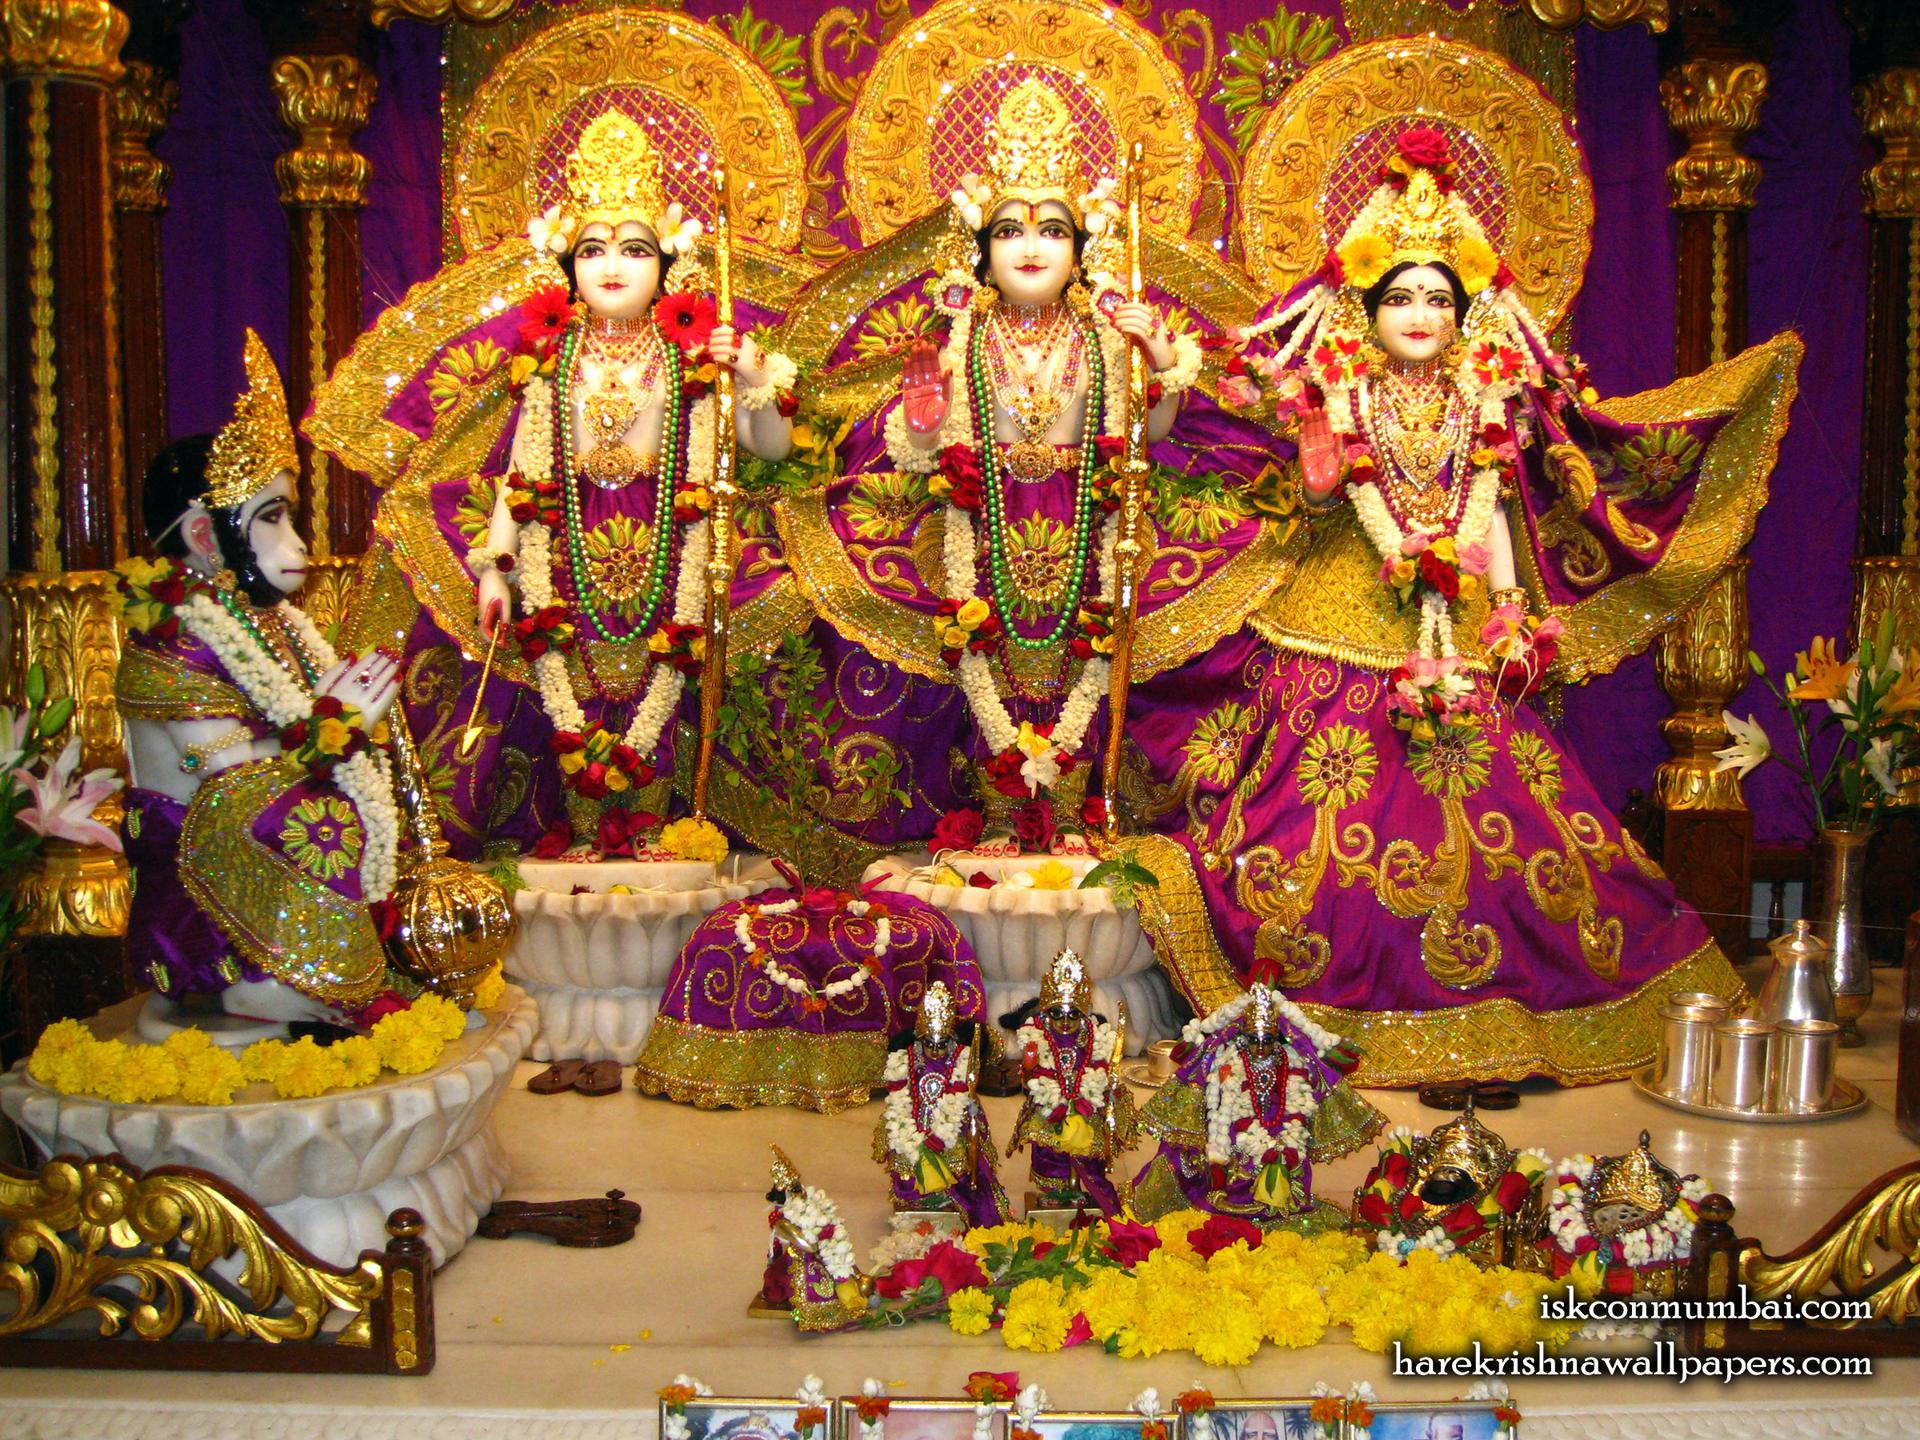 Sri Sri Sita Rama Laxman Hanuman Wallpaper (010) Size 1920x1440 Download